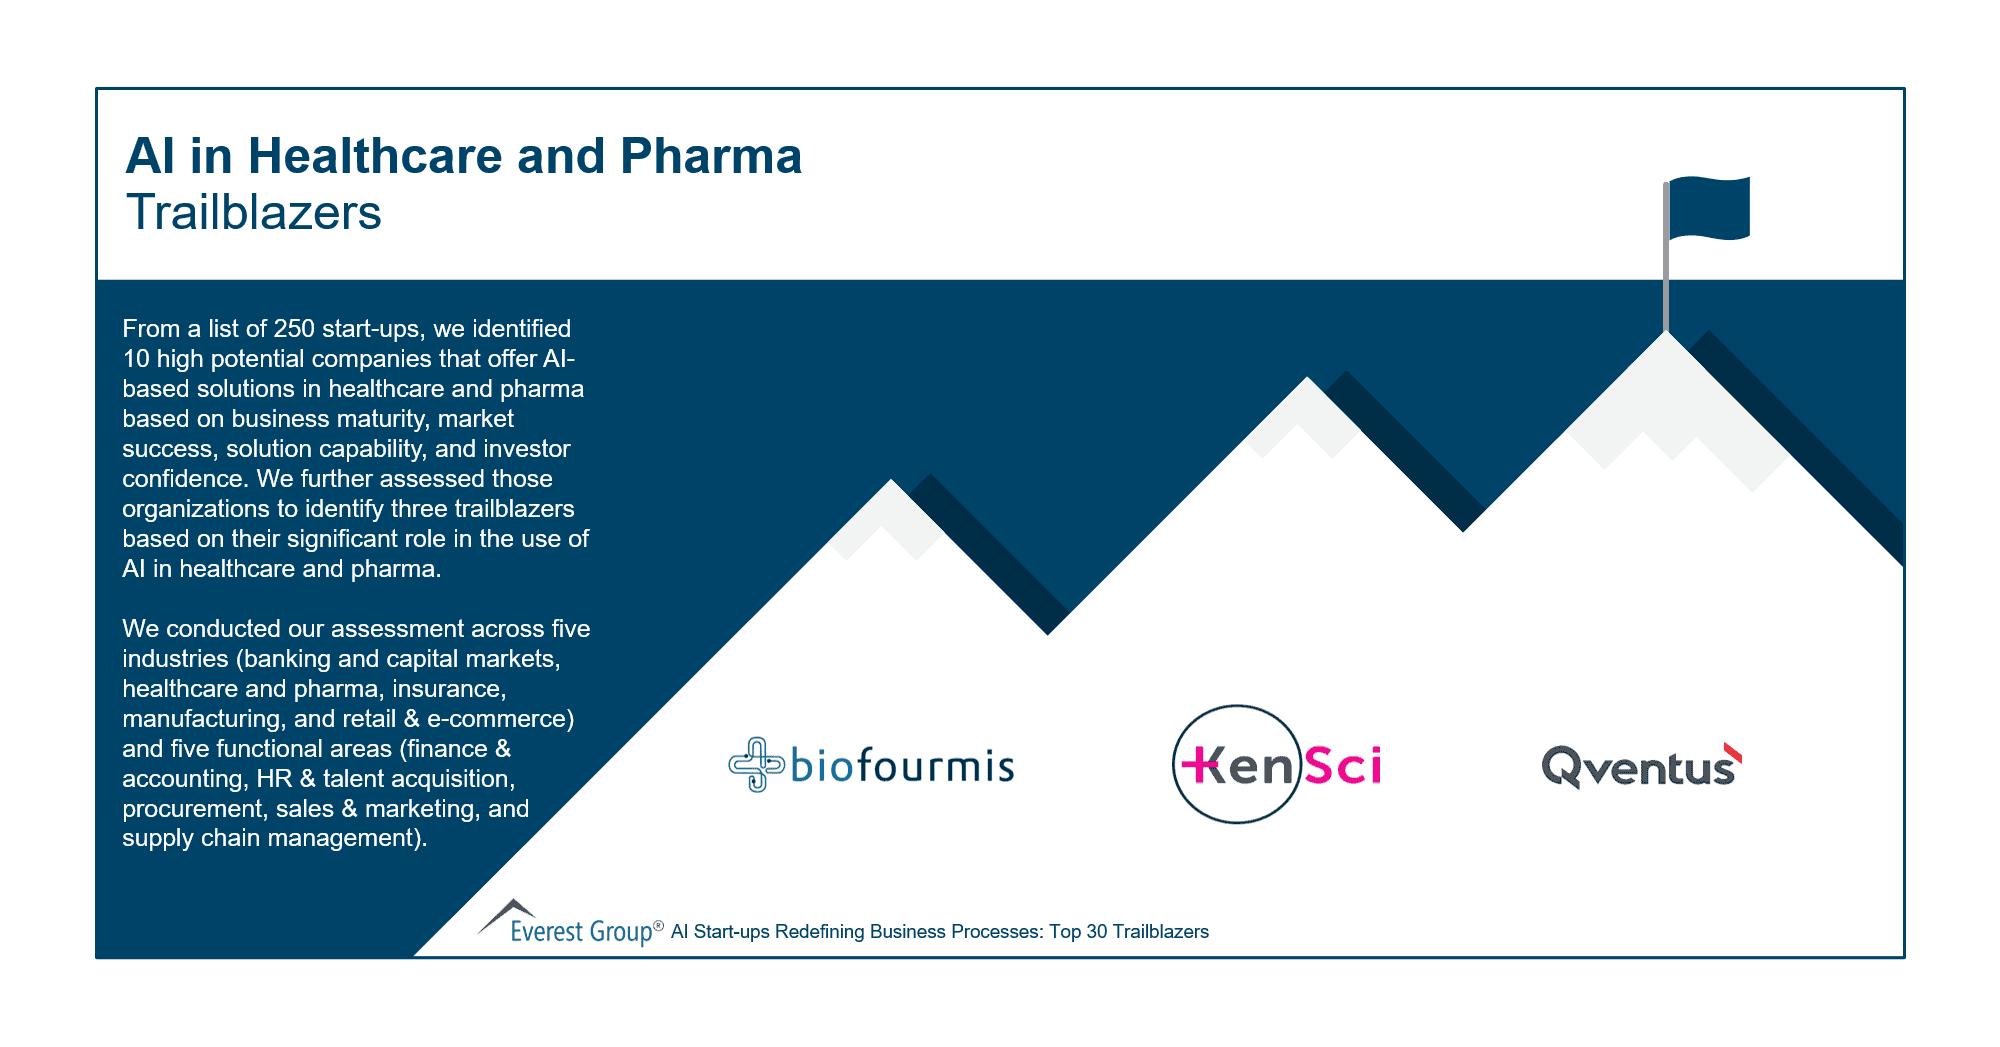 Trailblazers AI in Healthcare and Pharma